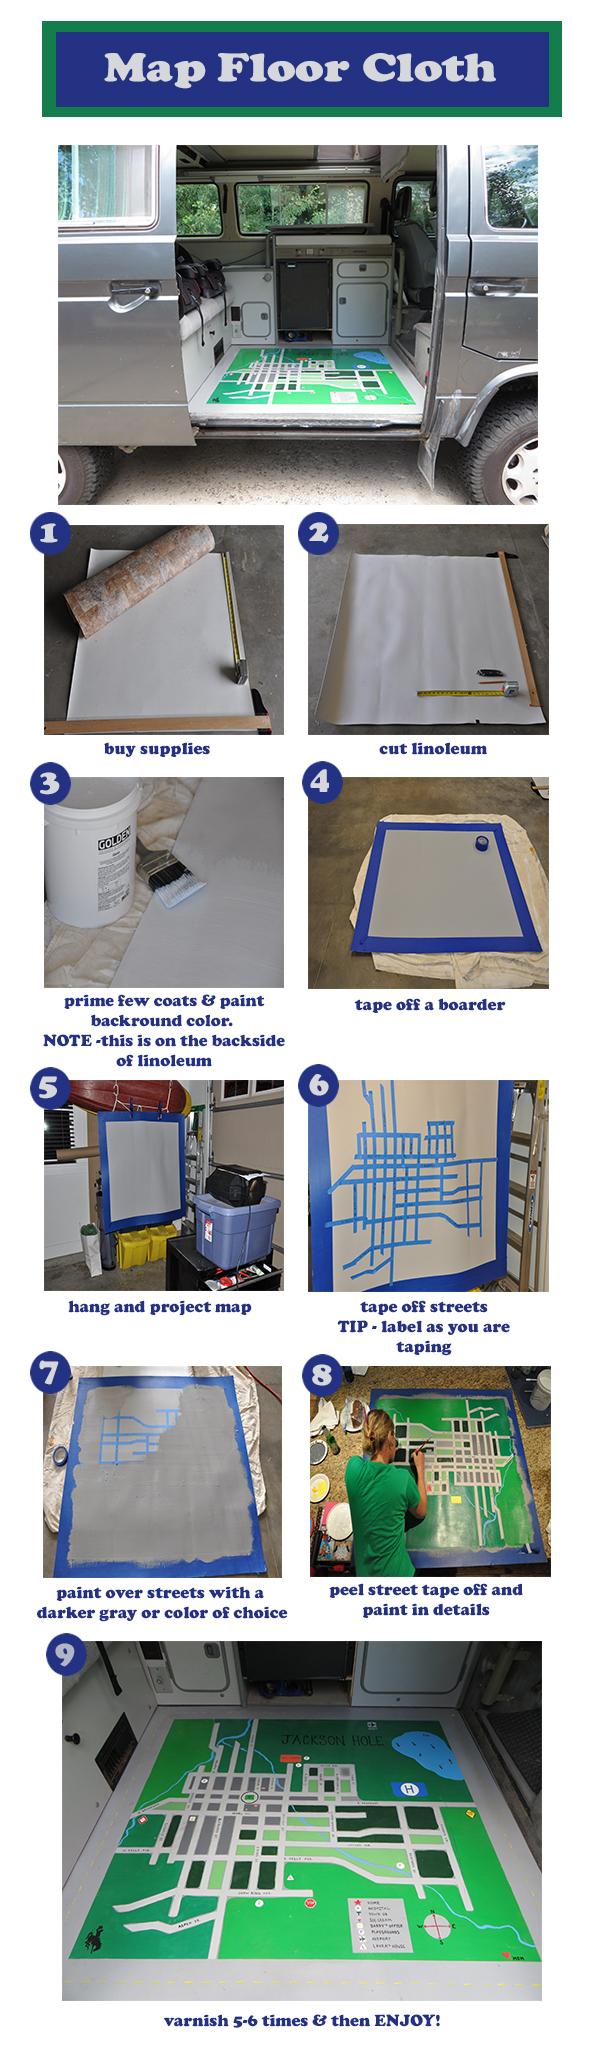 FloorCloth_1